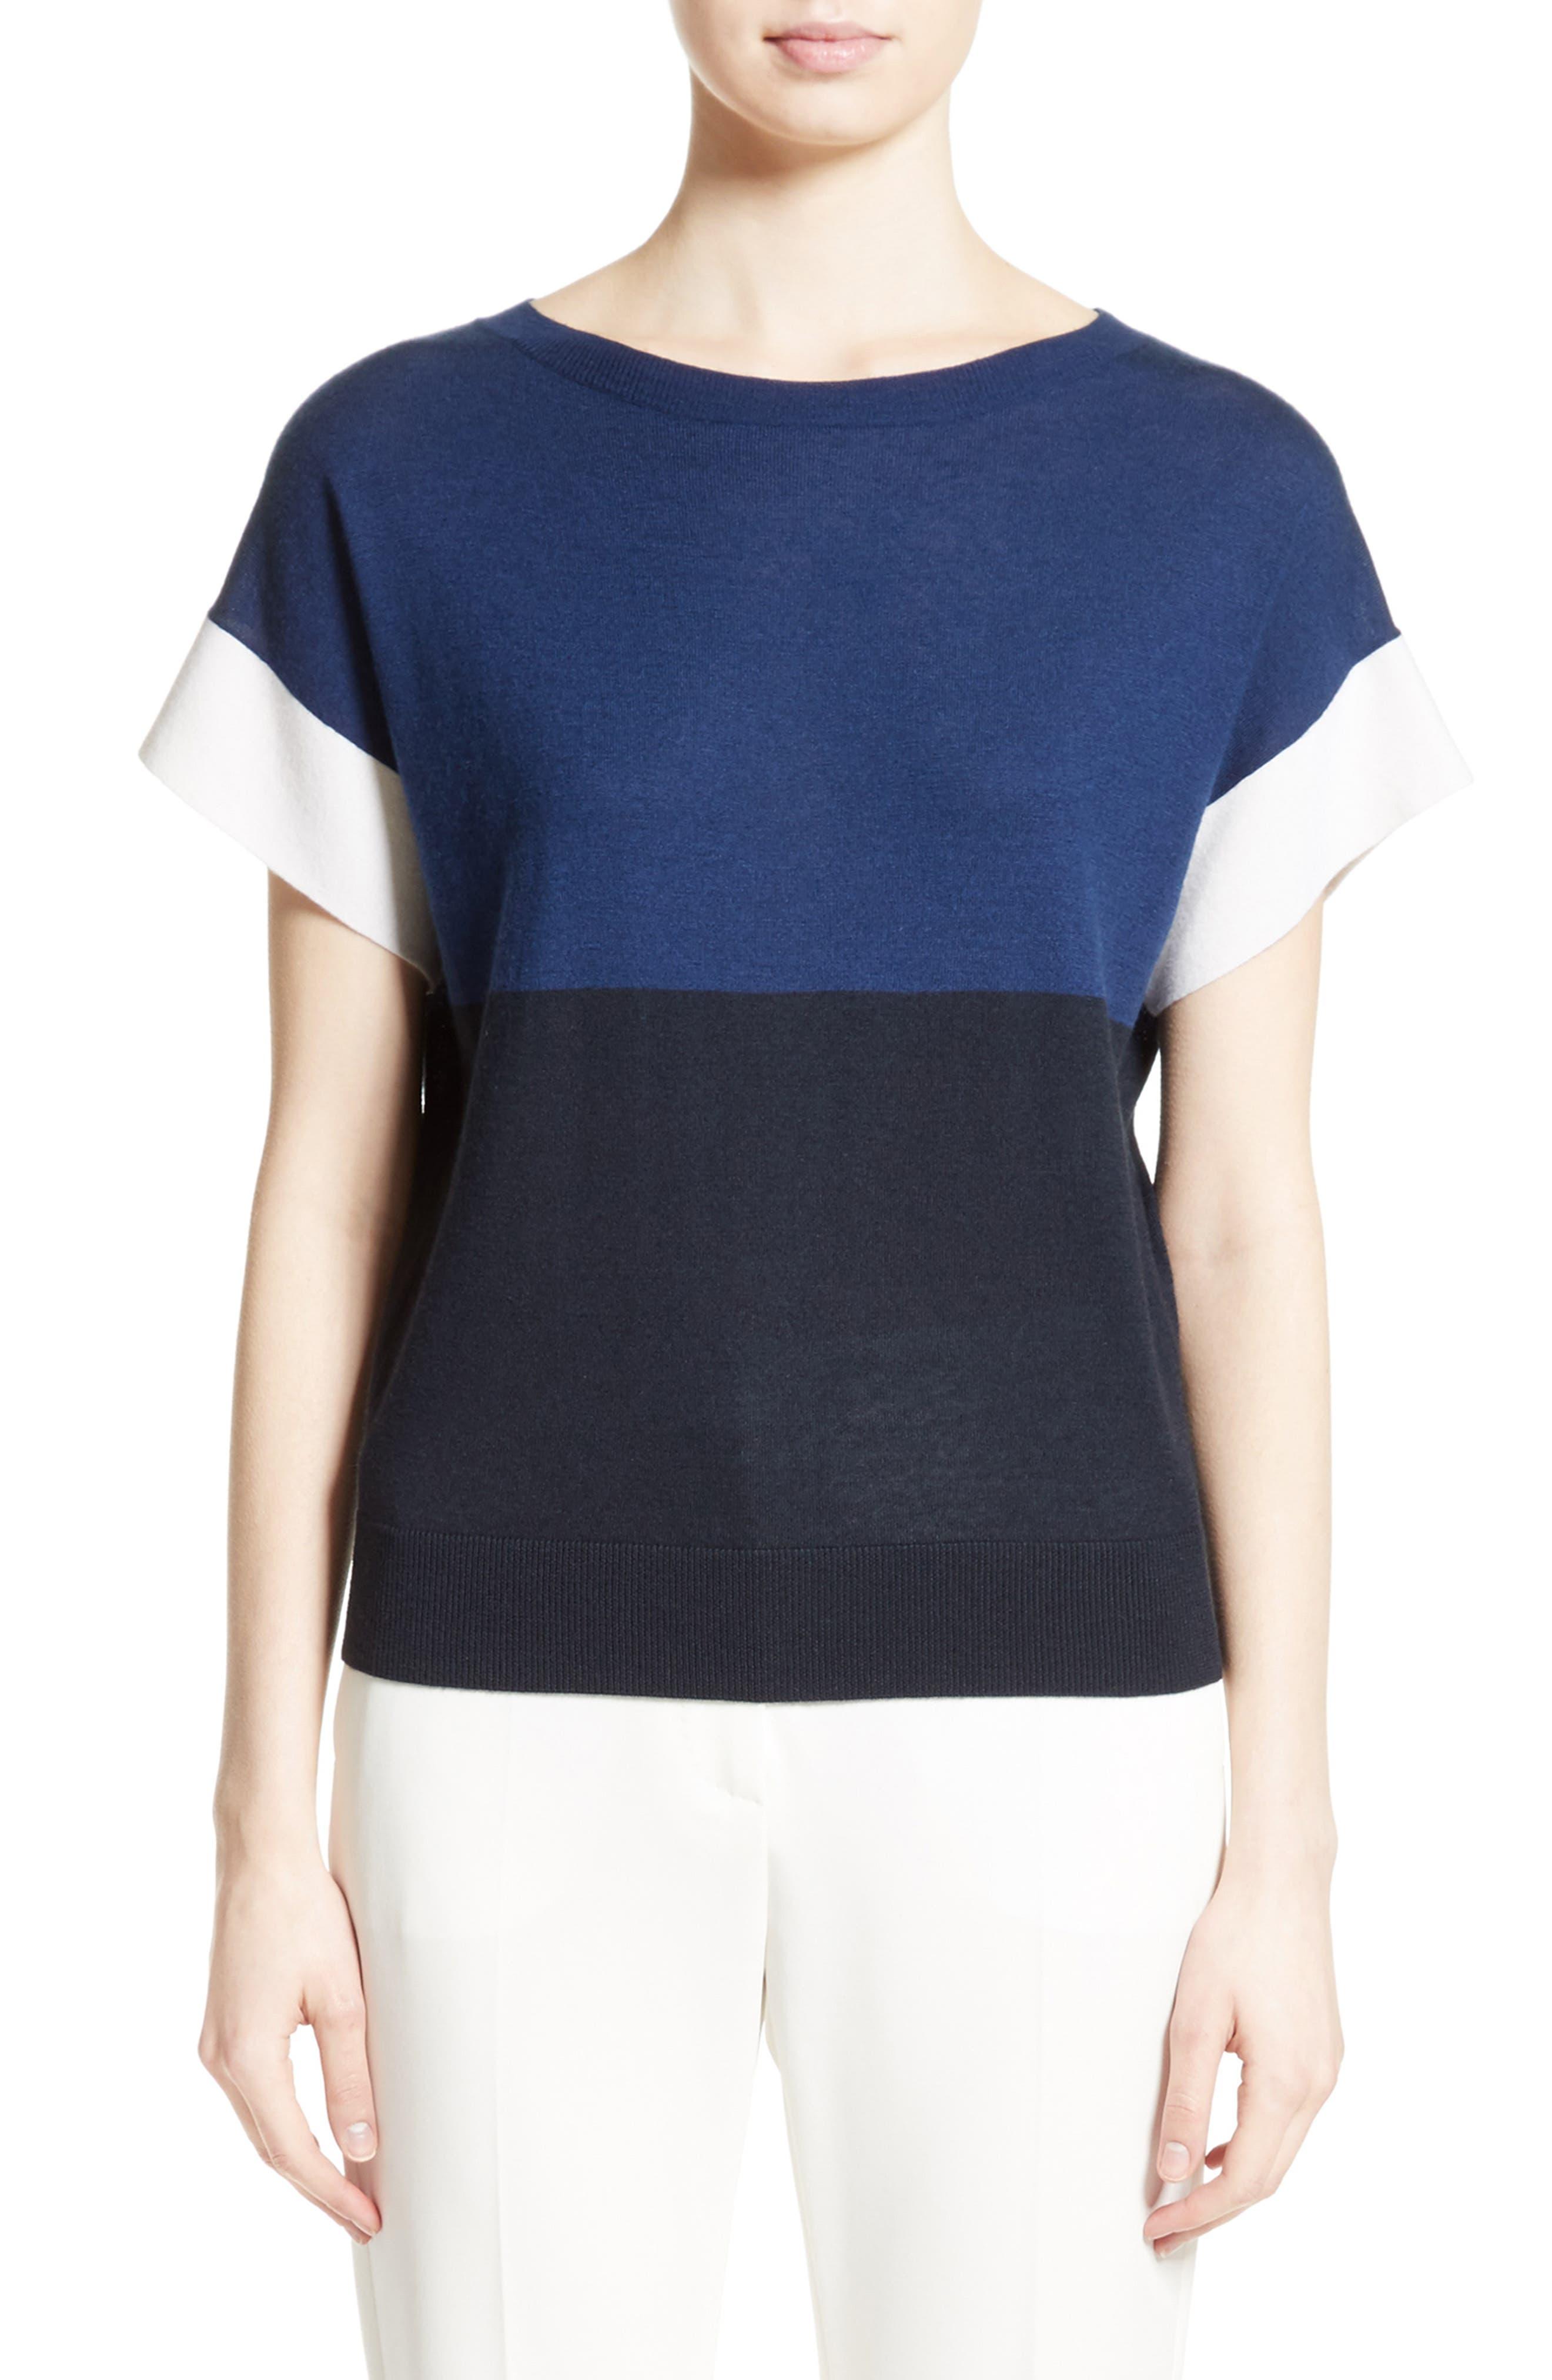 Colimbo Silk & Cashmere Top,                             Main thumbnail 1, color,                             Ultra Marine